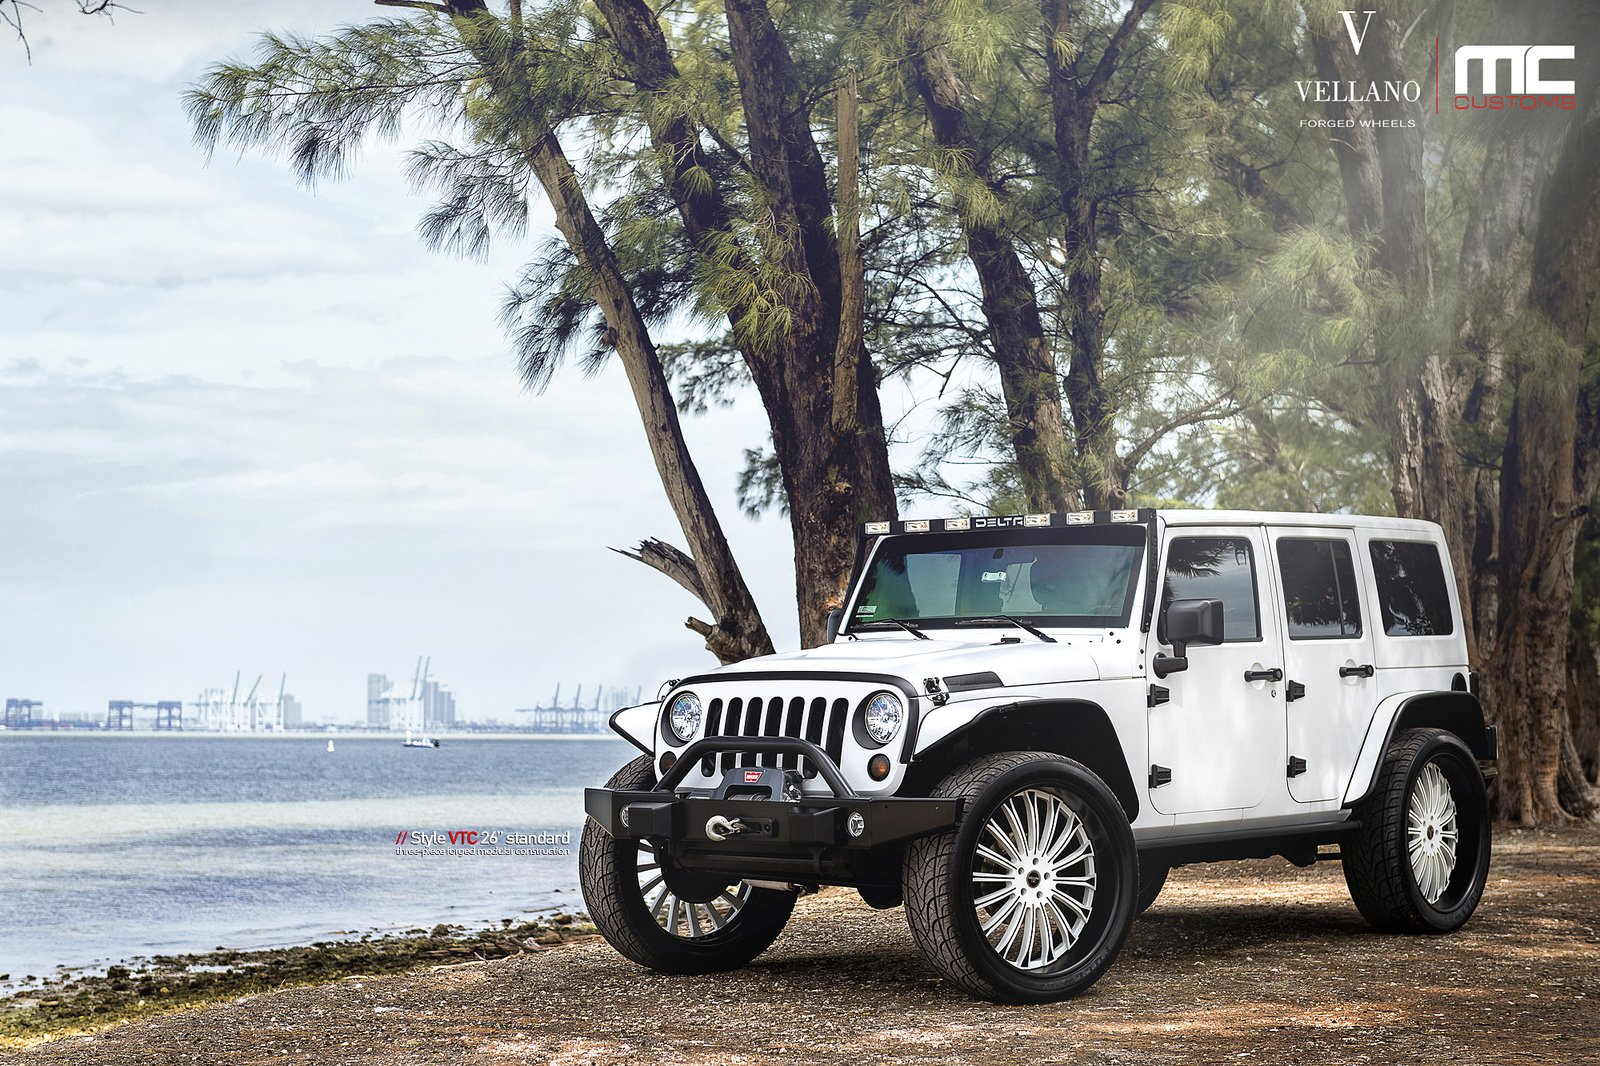 Jeep Wrangler Tuning >> White Jeep Wrangler Wallpaper - WallpaperSafari